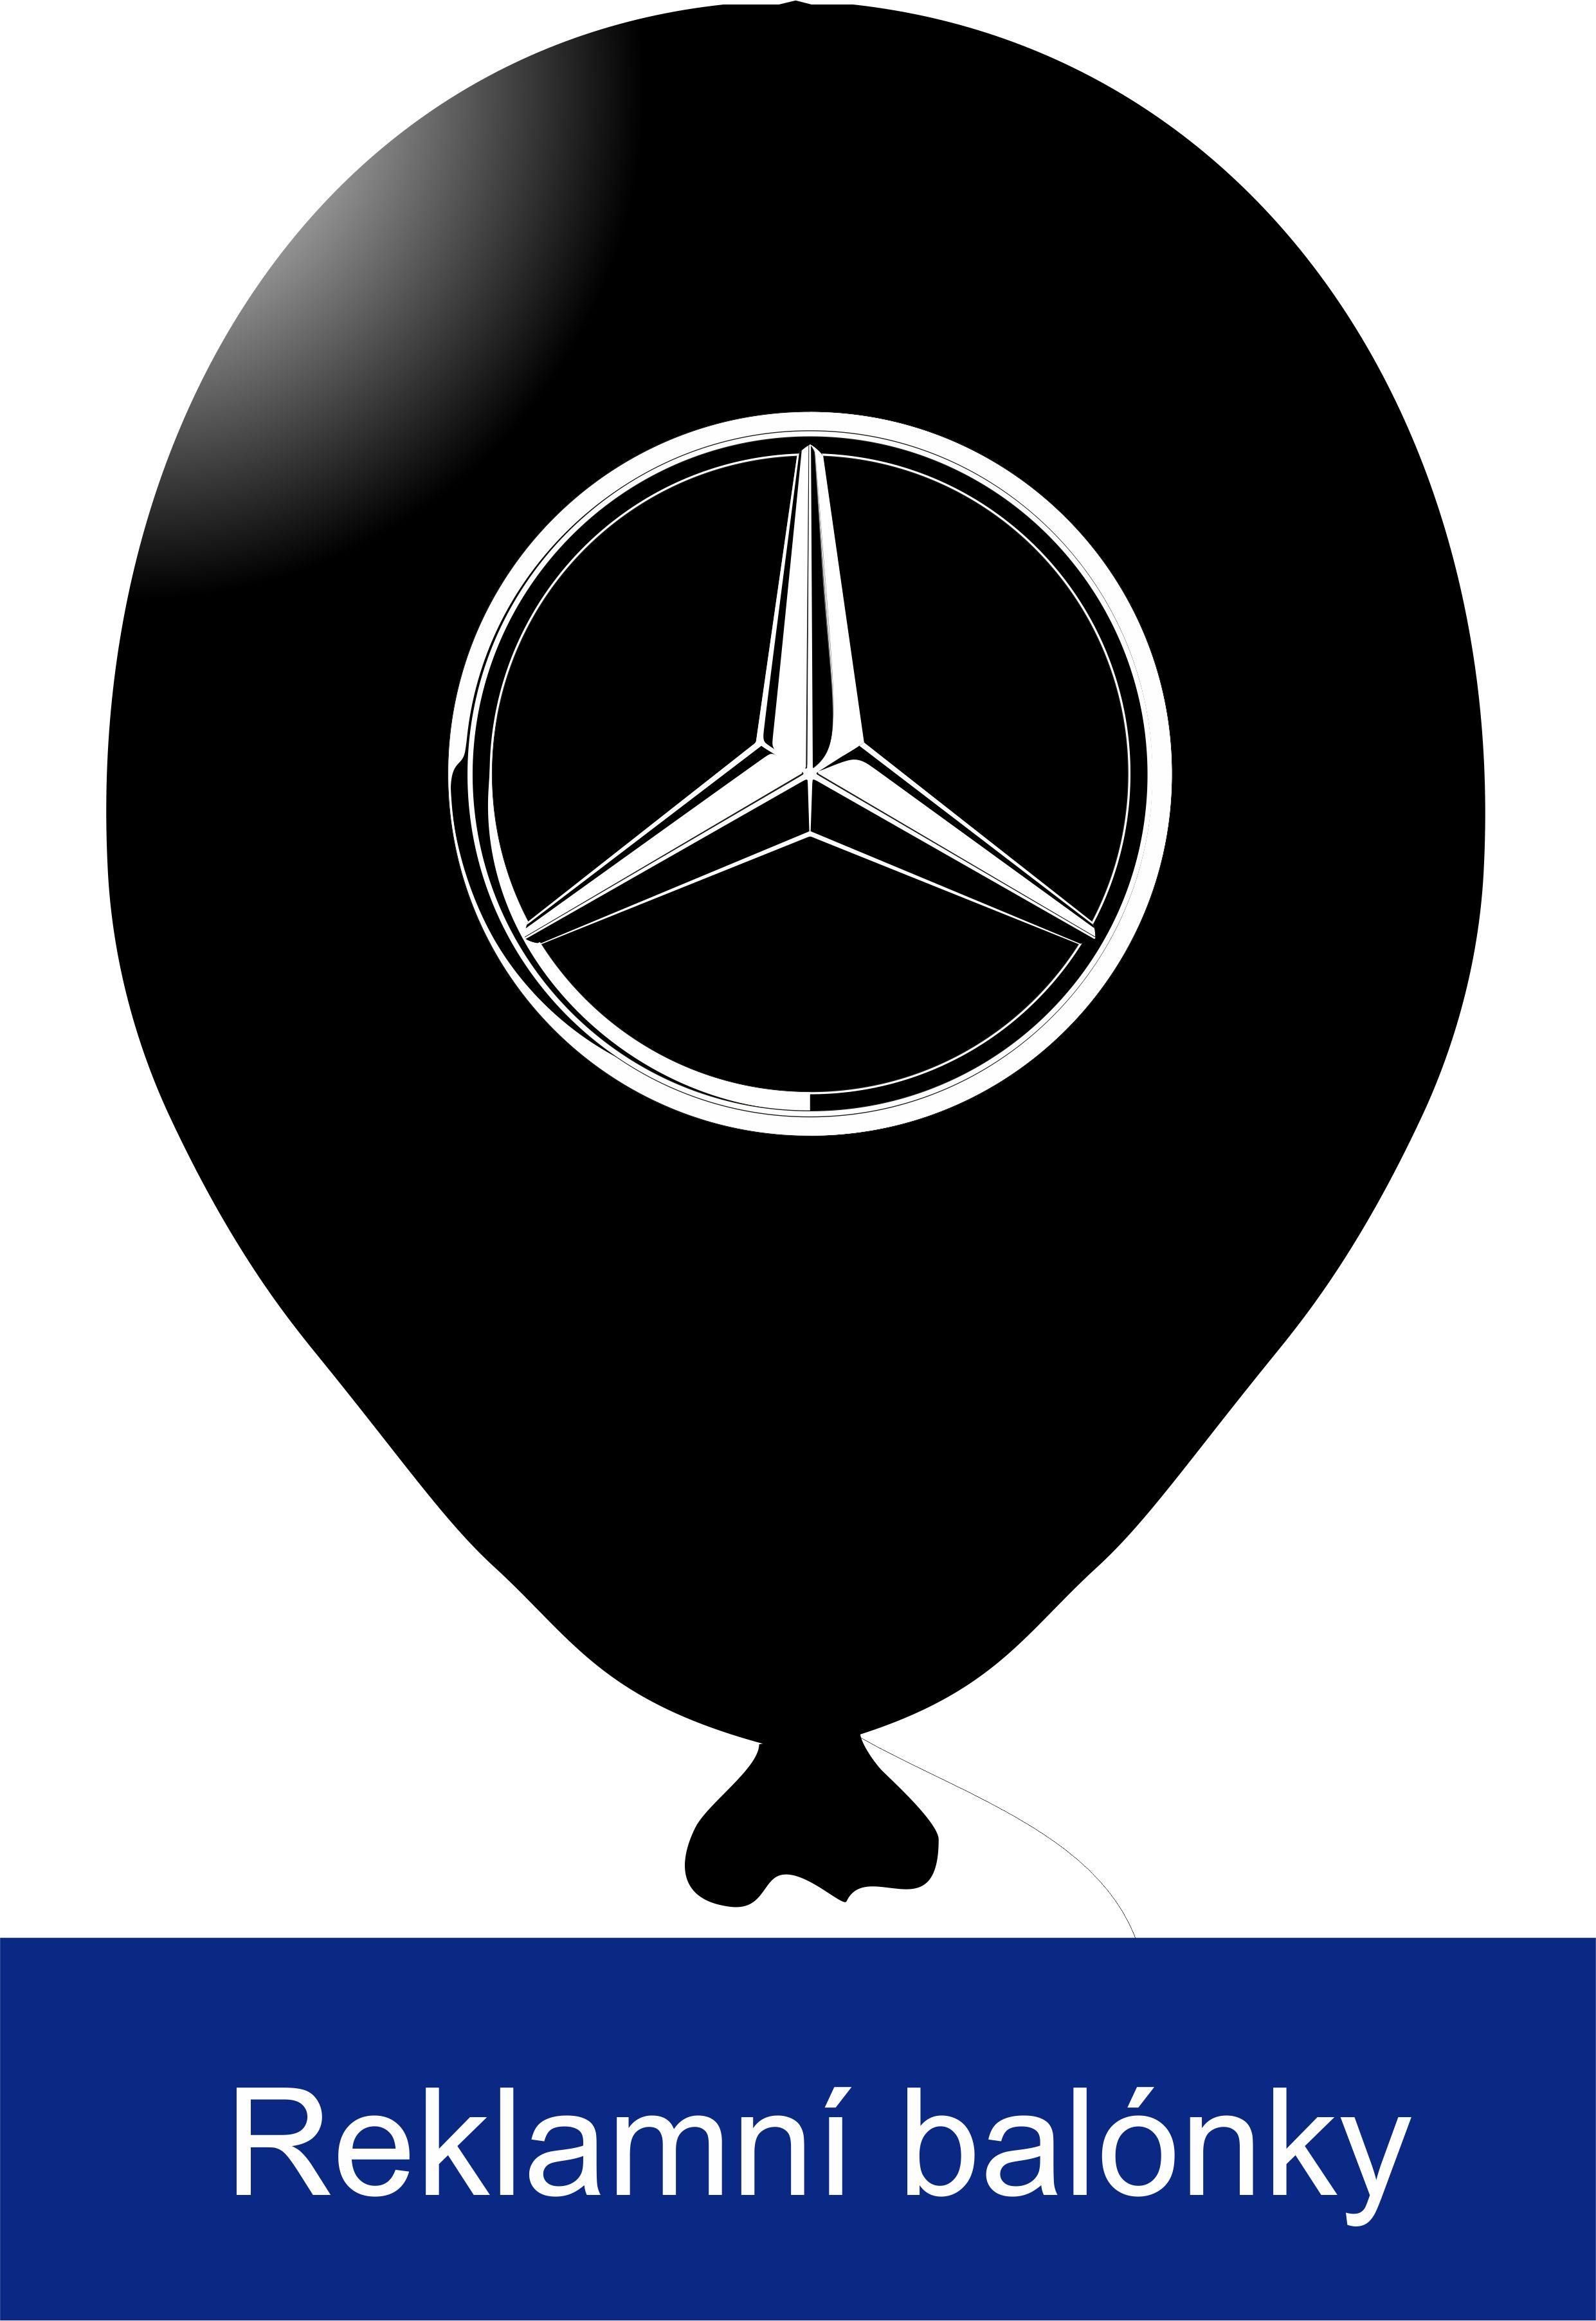 reklamni-balonky-1